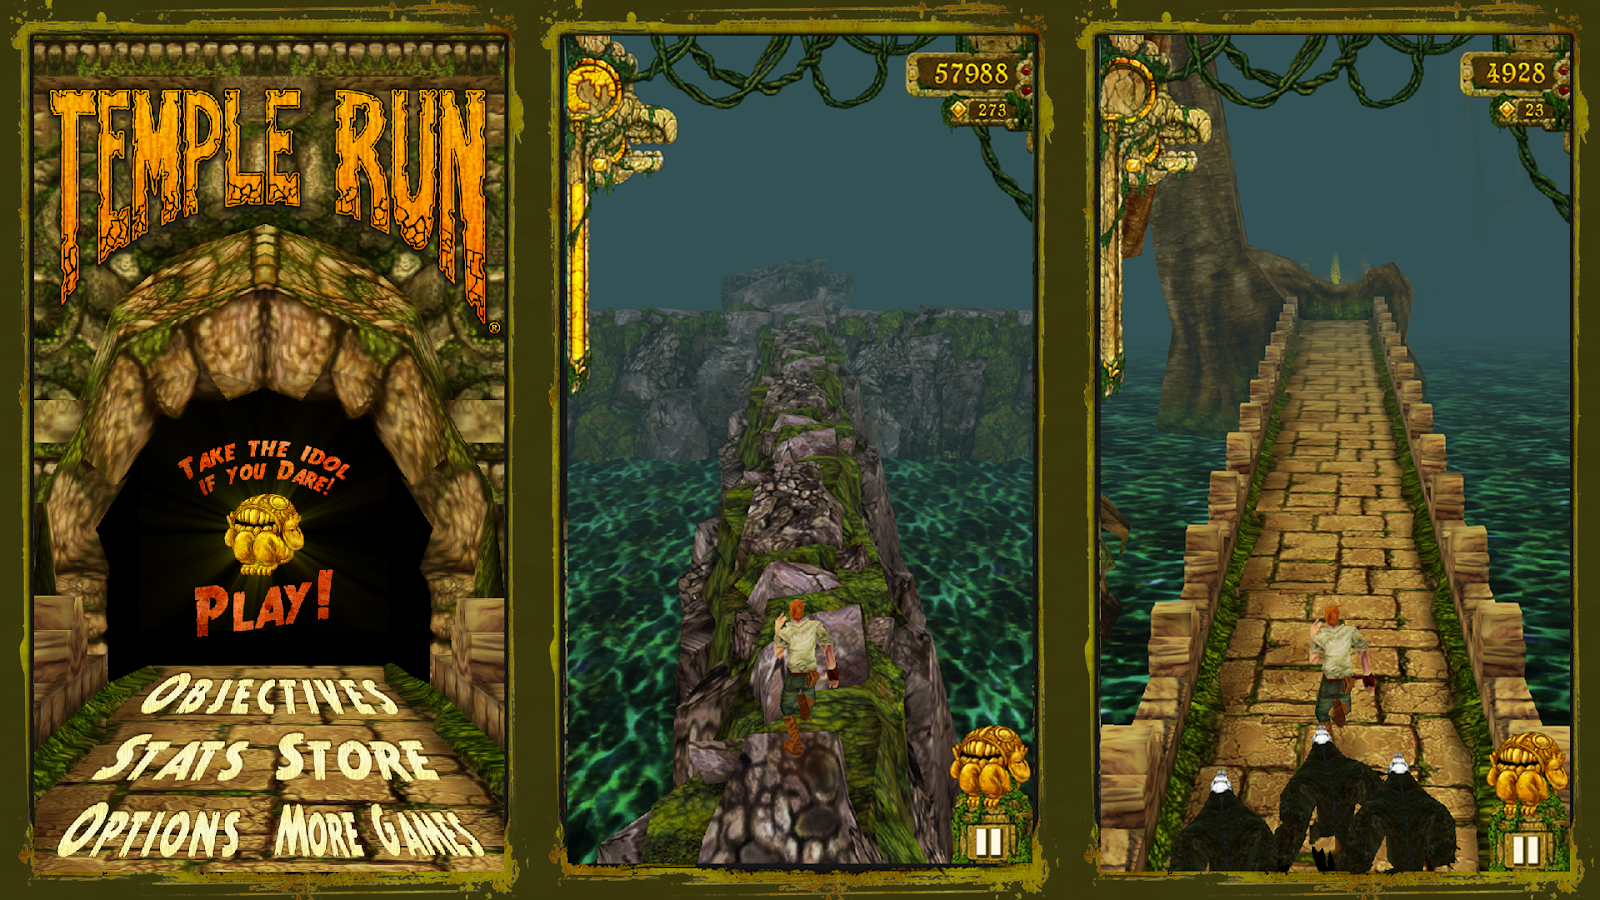 Screenshots of Temple Run for iPhone